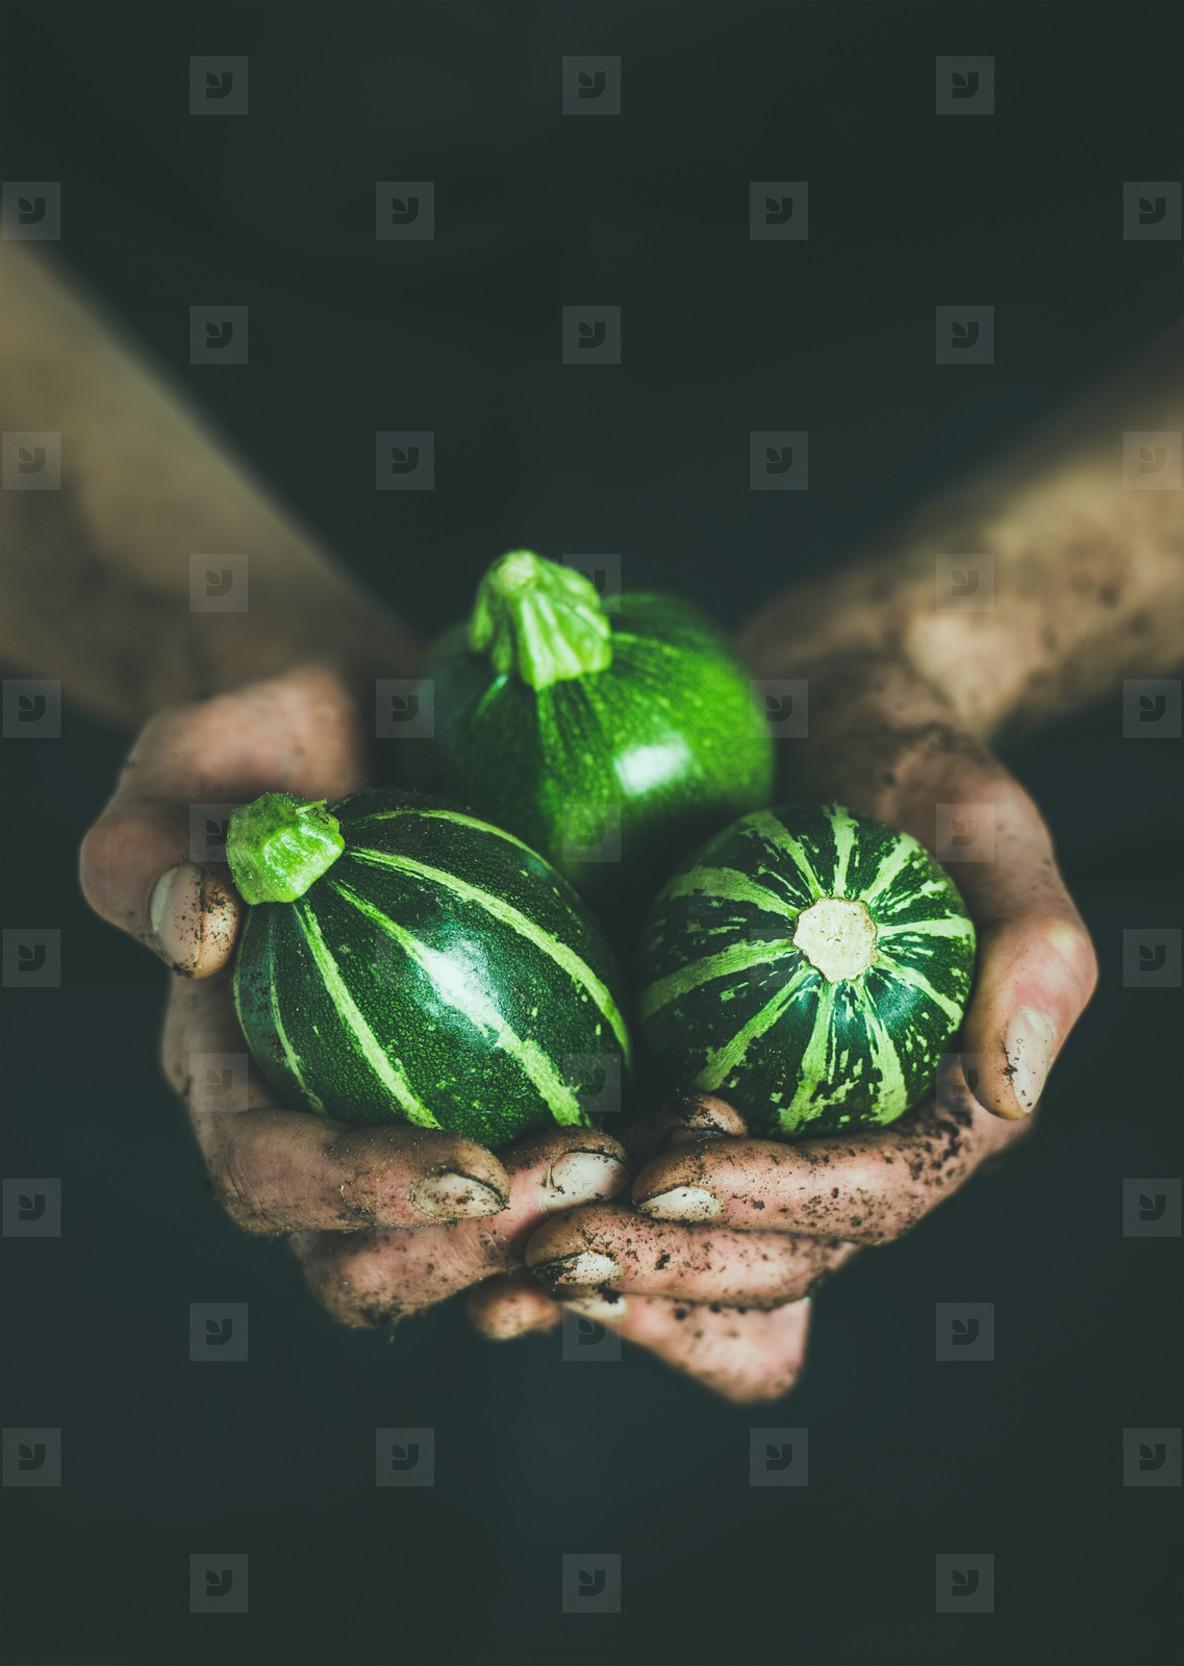 Farmer holding fresh seasonal green round zucchinis in hands